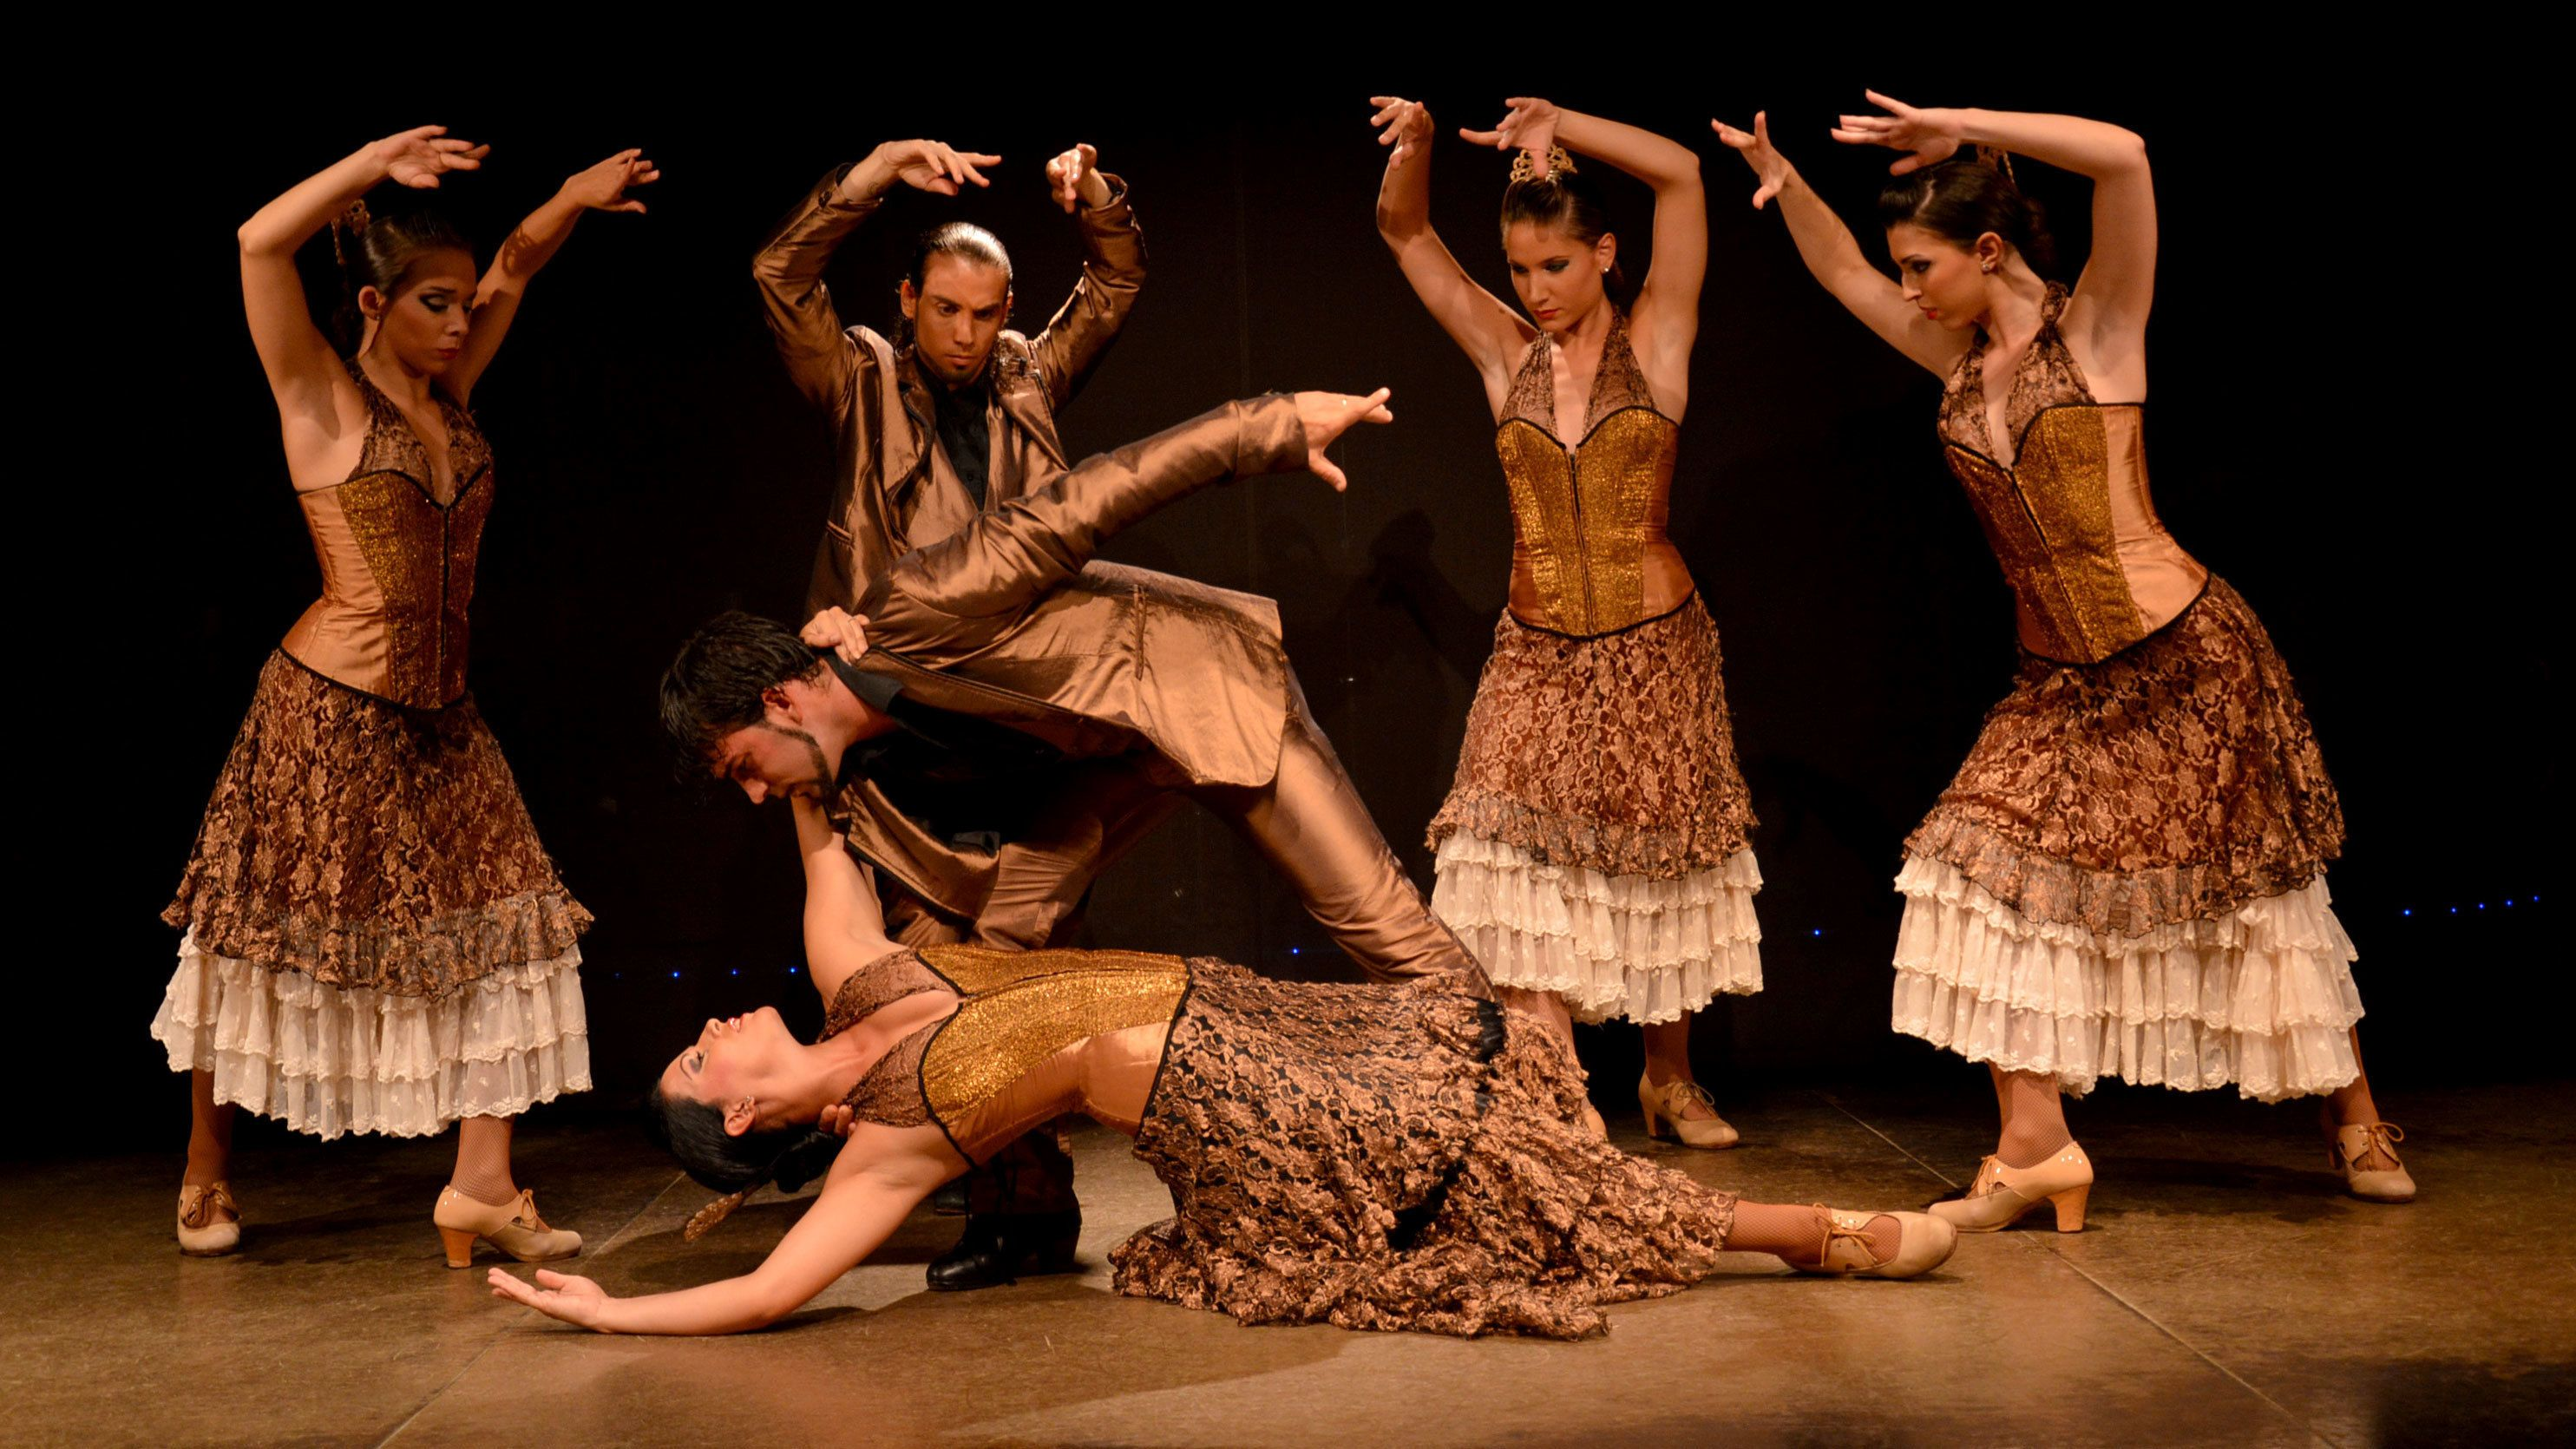 Flamenco Show at Palacio del Flamenco